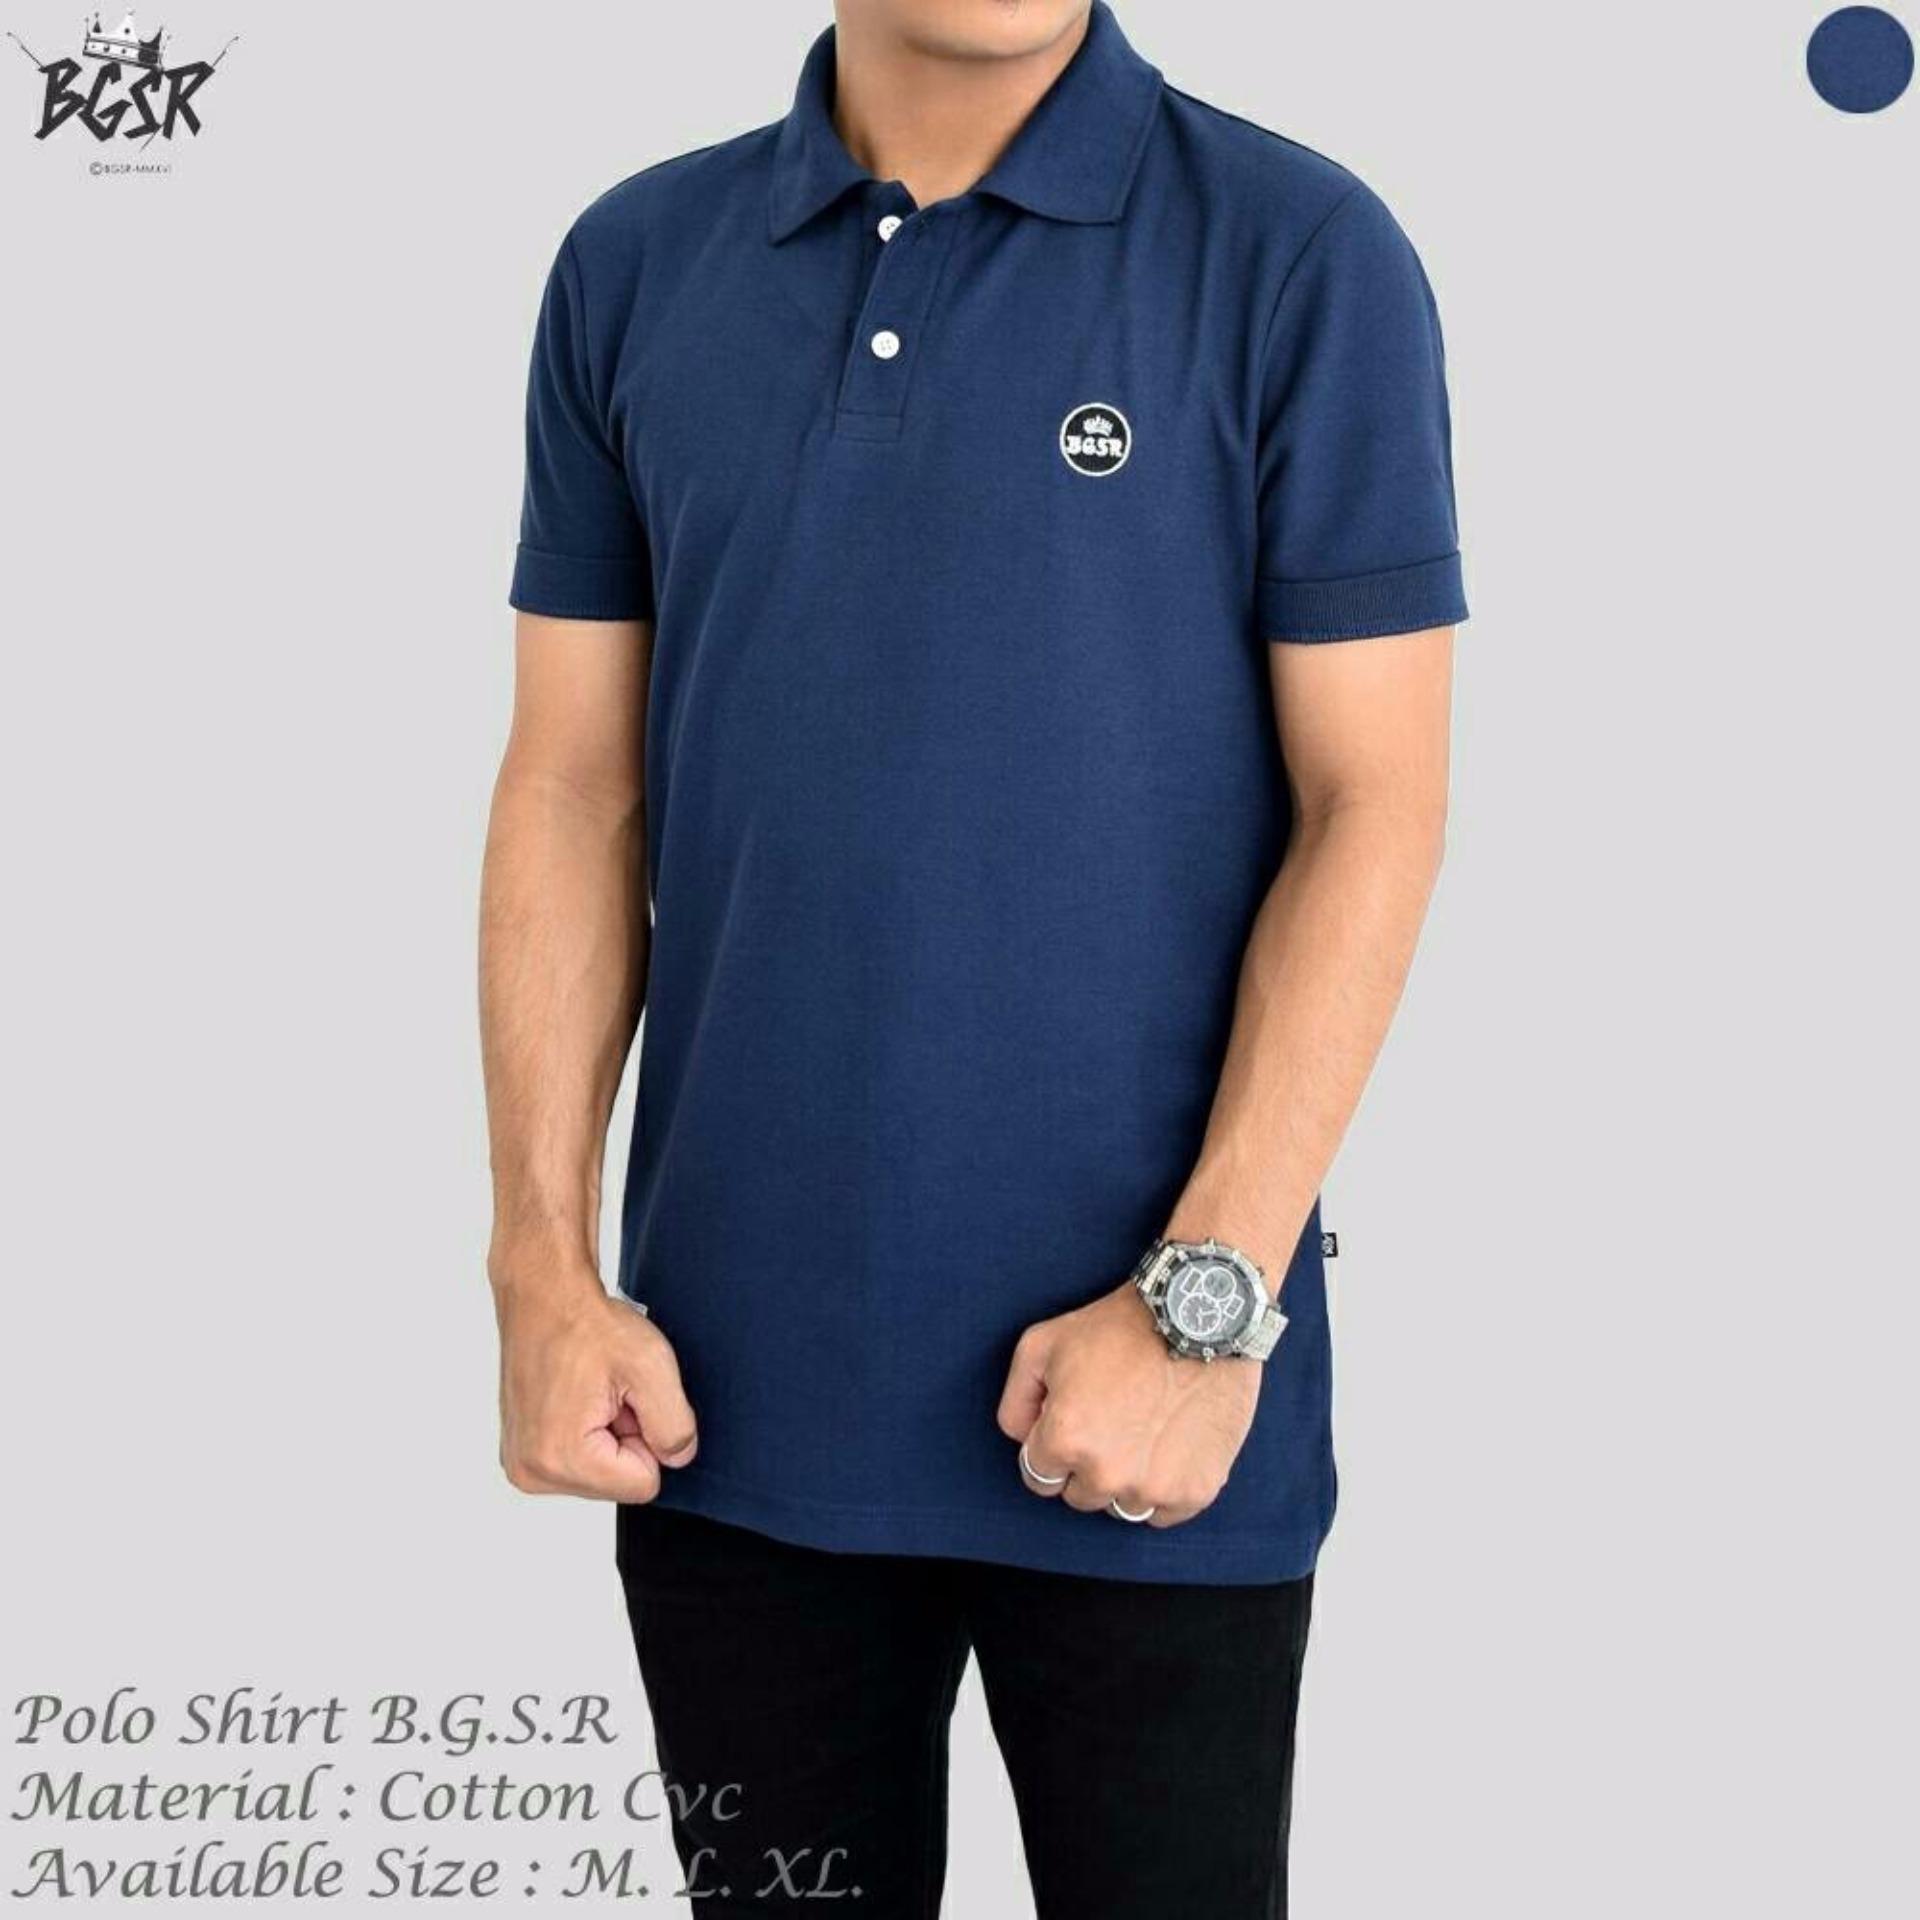 Azure Fashion Polo Wangky Navy Shirt Kaos Pria Lacoste 07717860 Hijau Krahhitam Xl